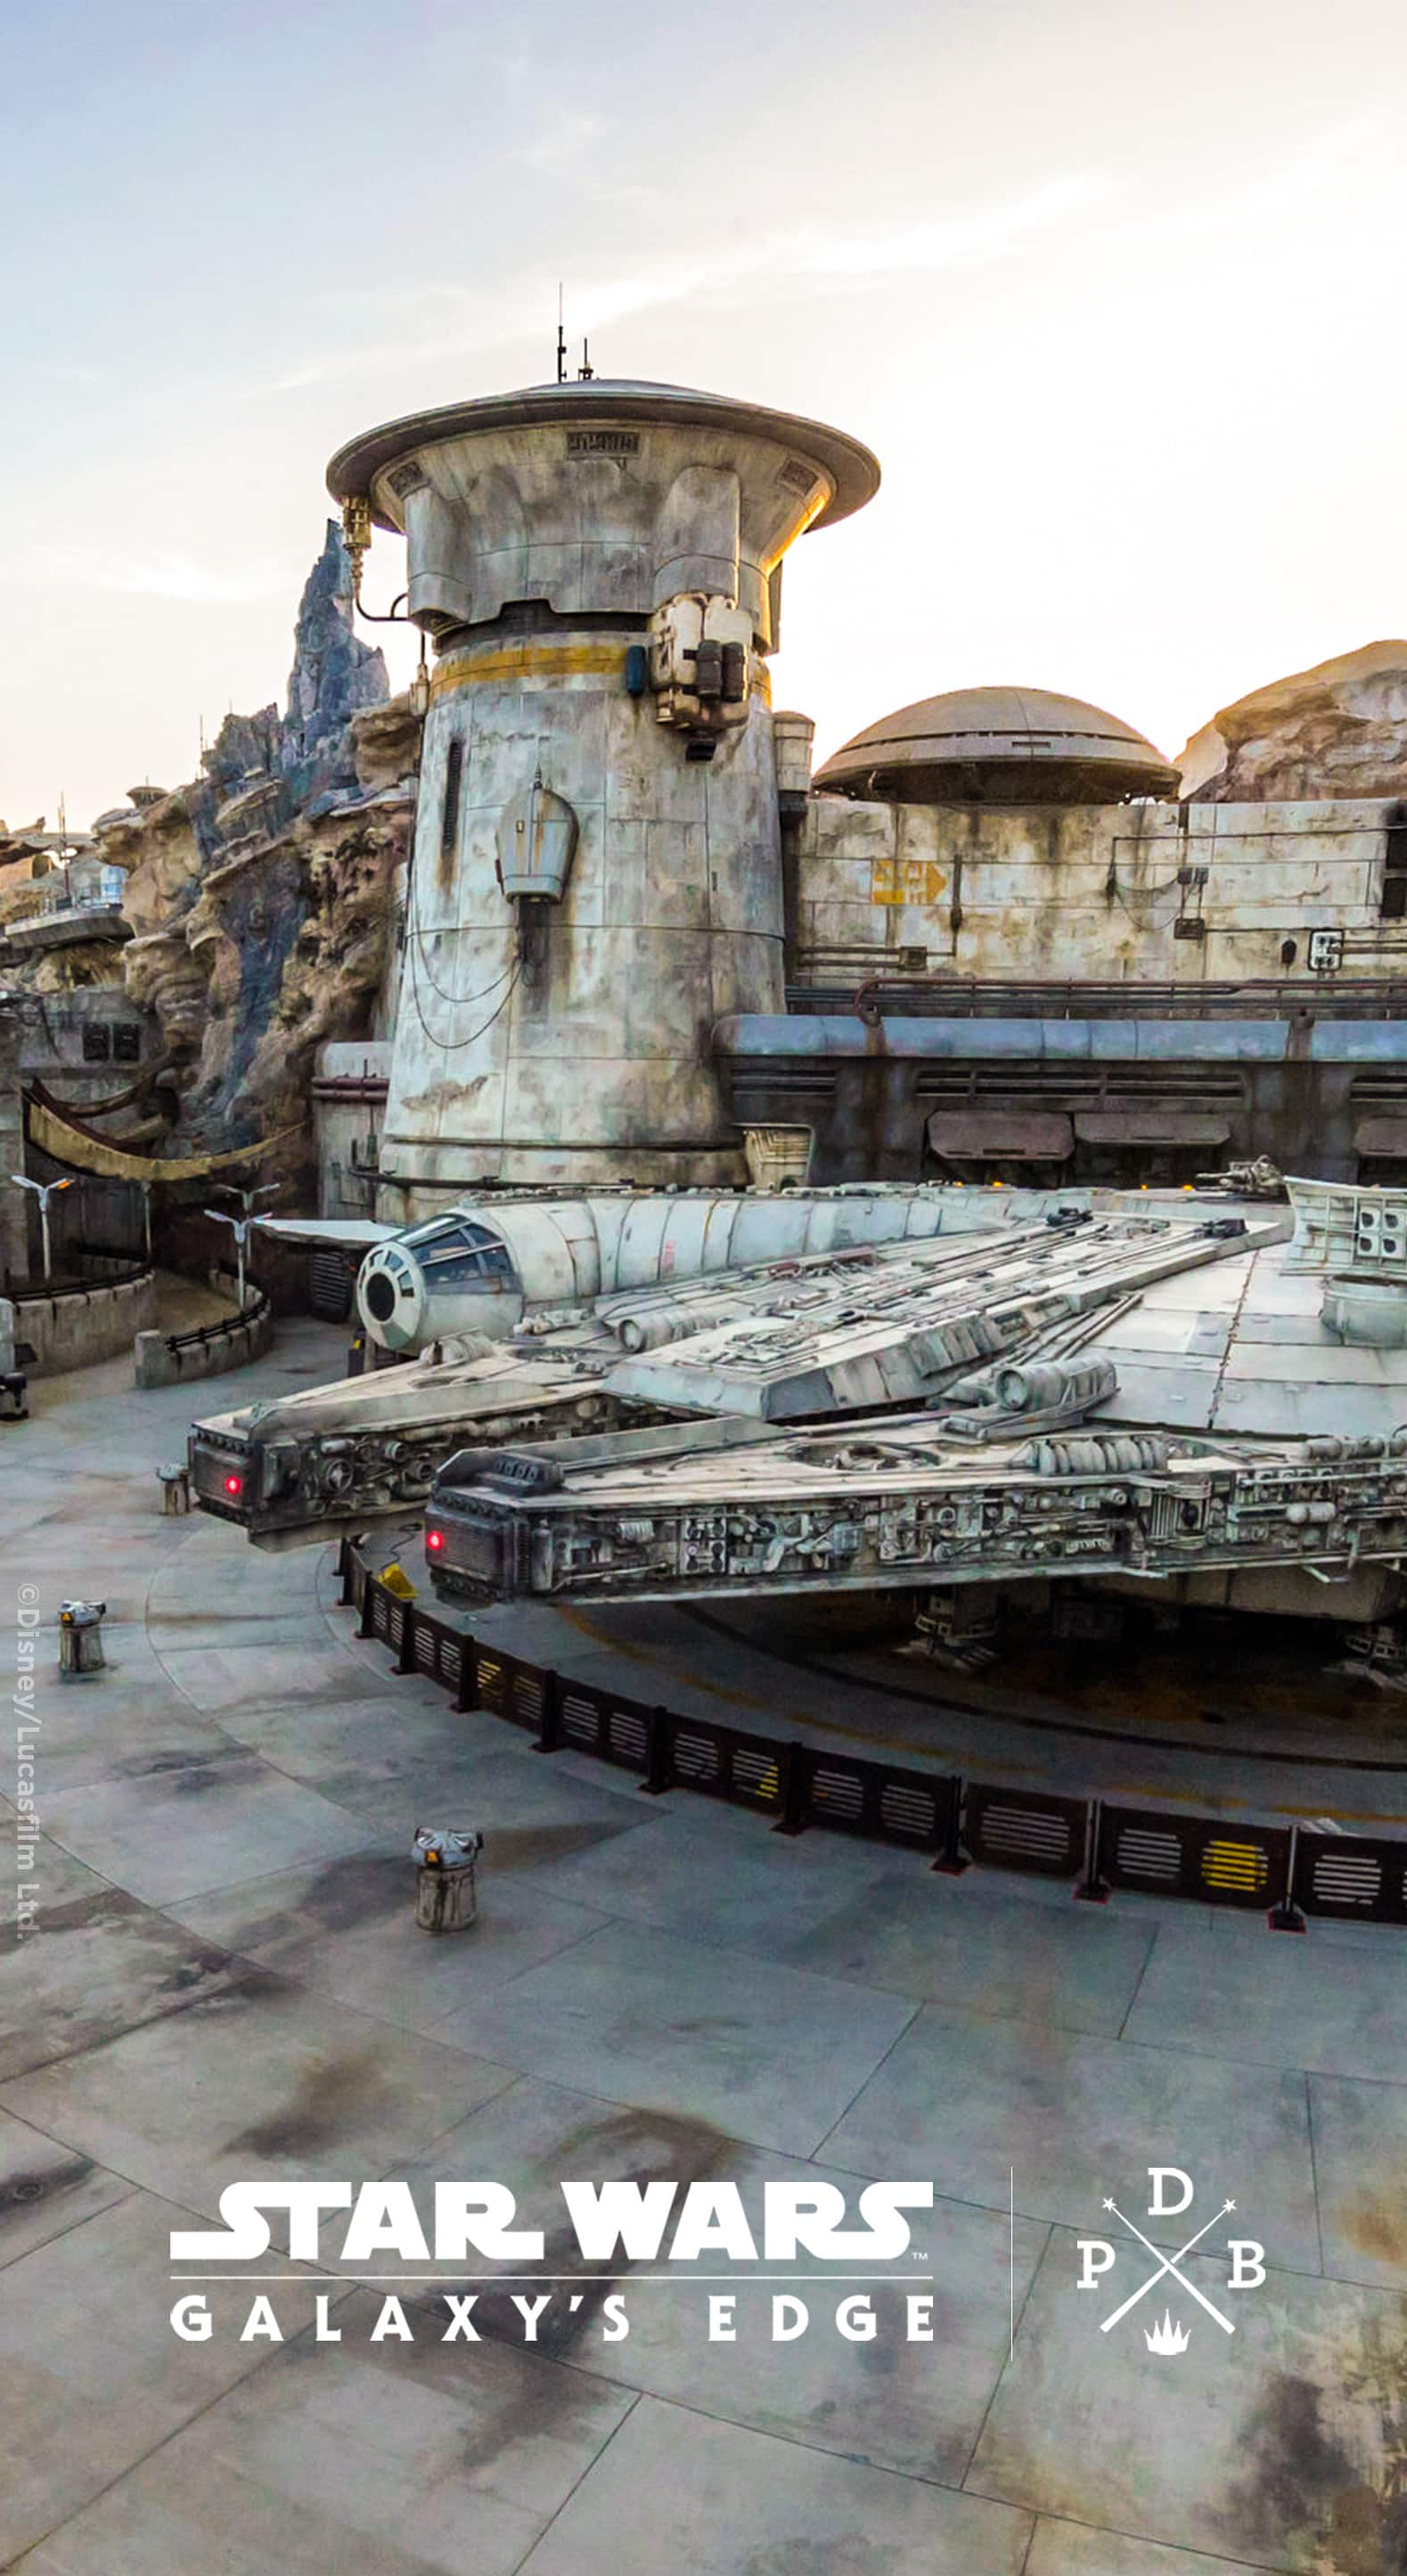 Star Wars Galaxy S Edge At Disneyland Resort Wallpaper Iphone Android Disney Parks Blog